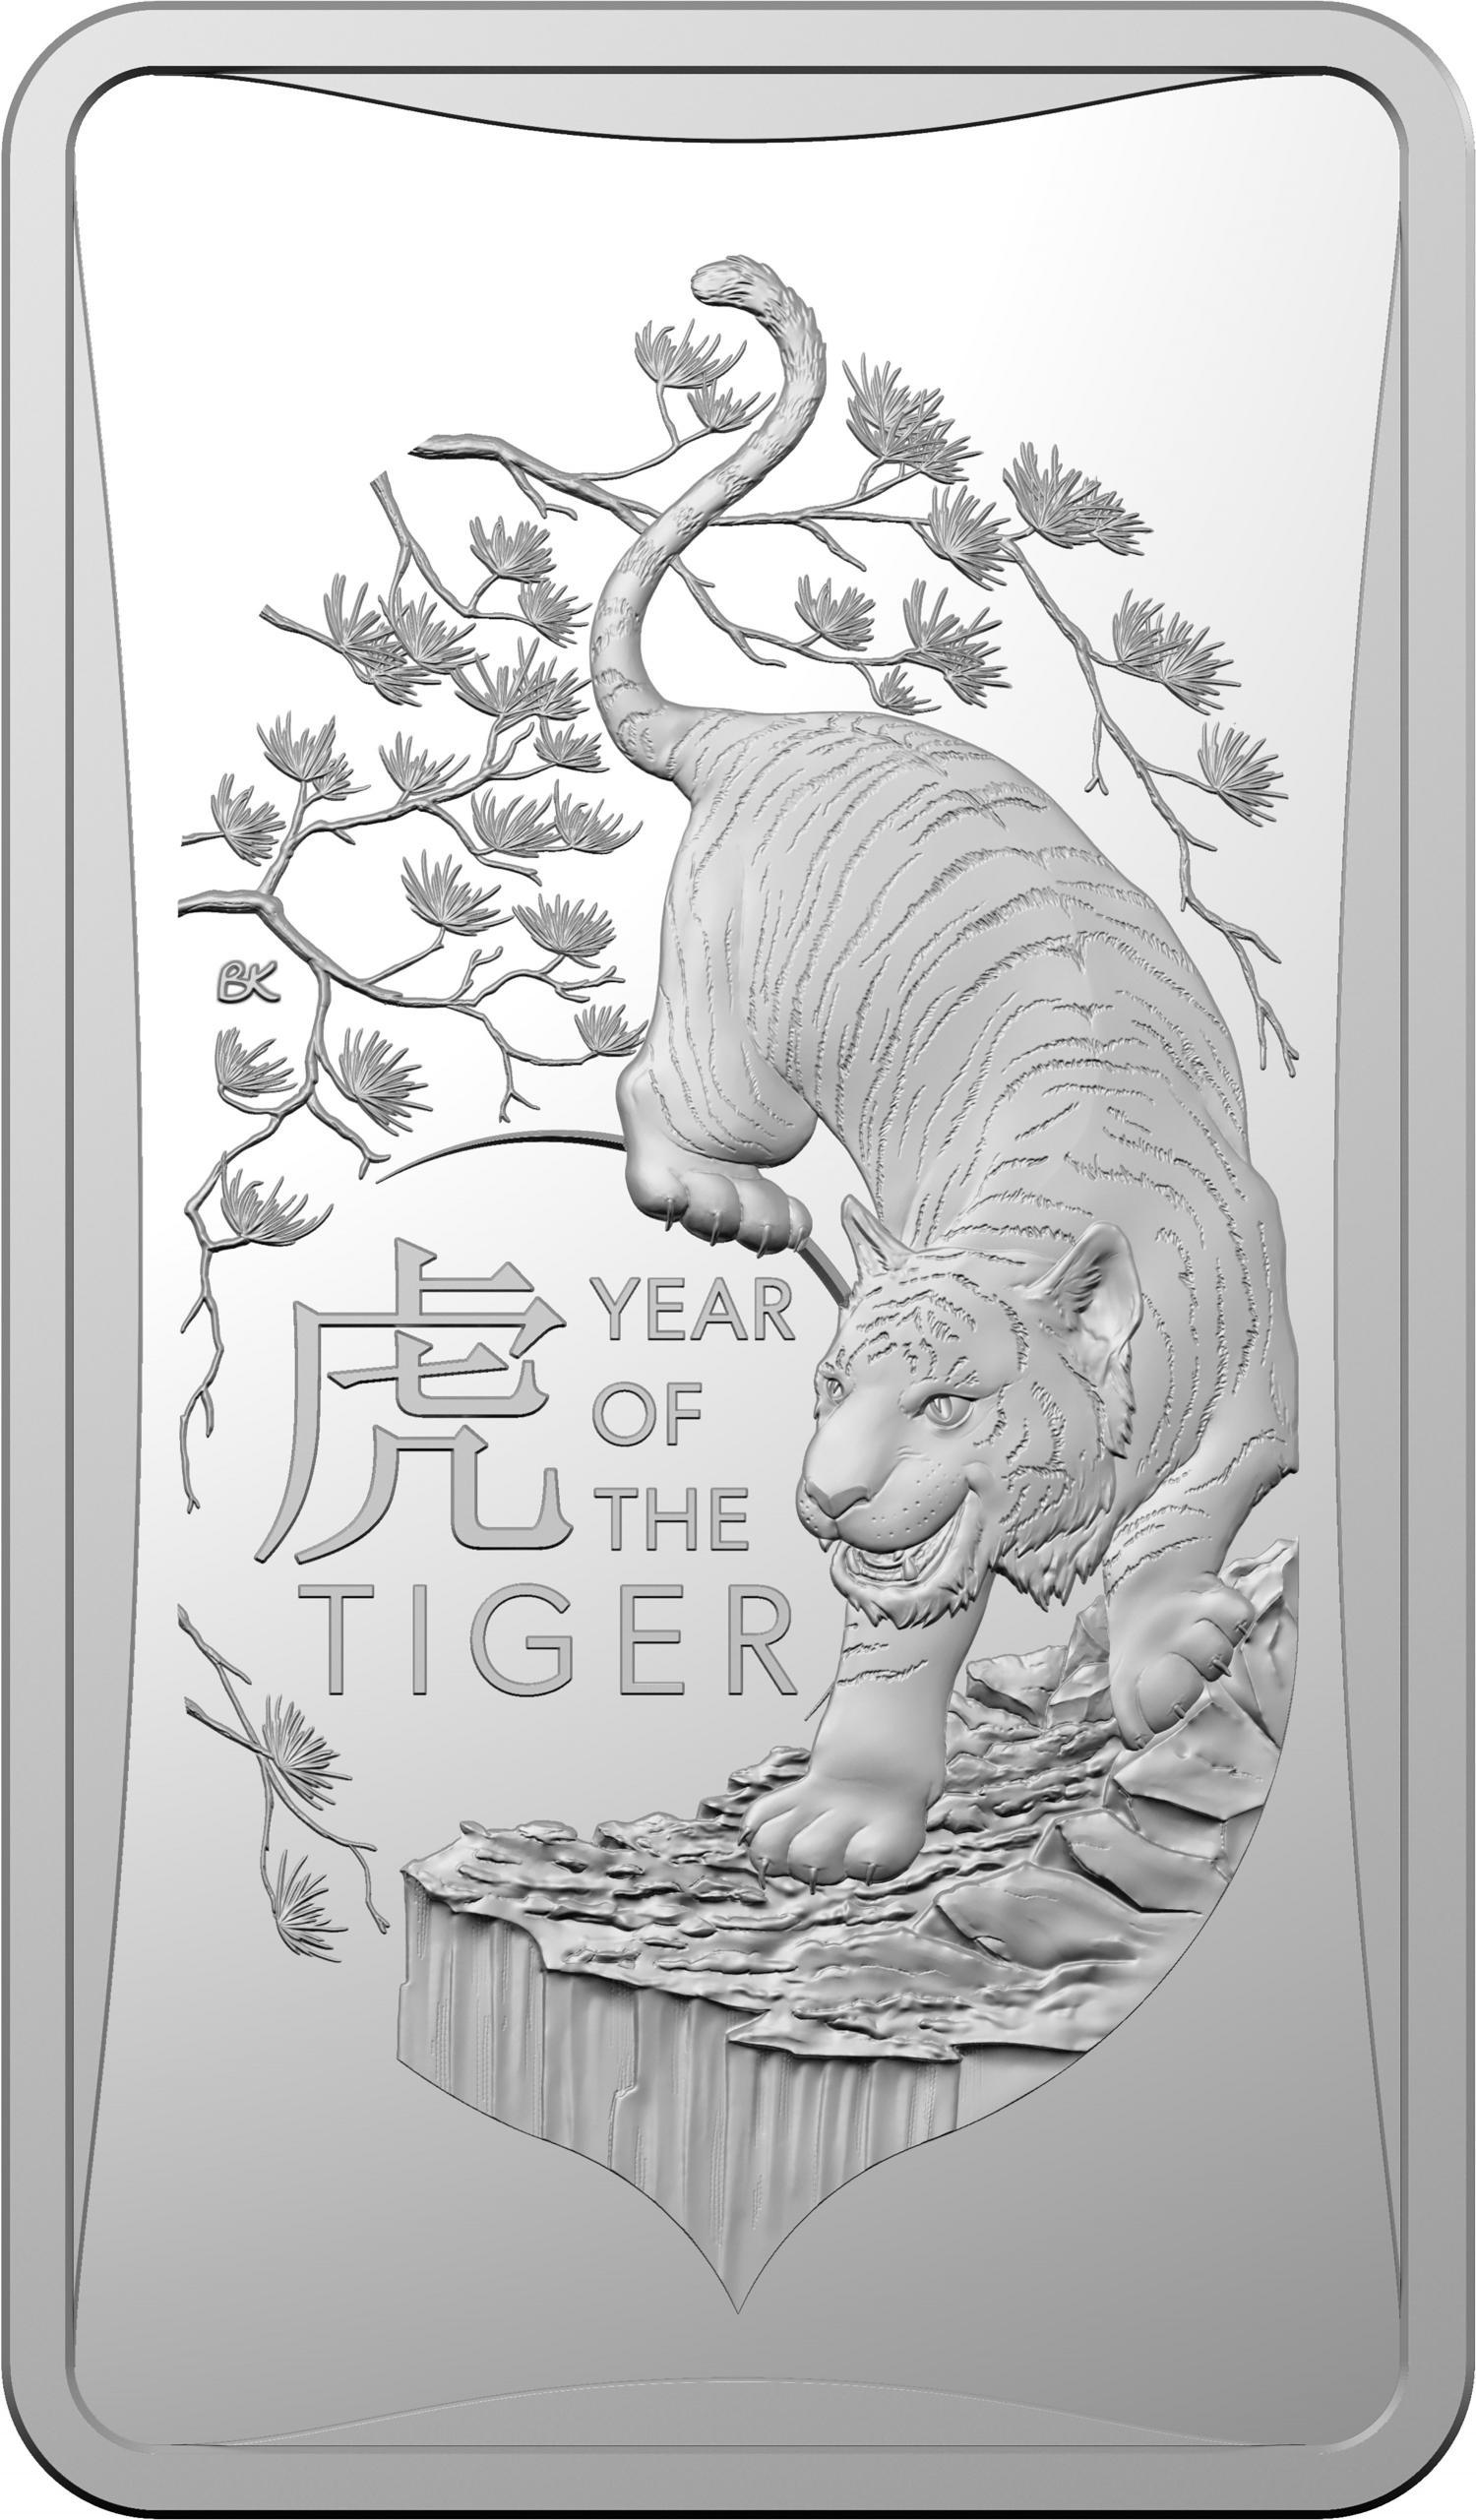 Thumbnail for 2022 $1 FRUNC Half oz INGOT Year of the Tiger Ag  Coin